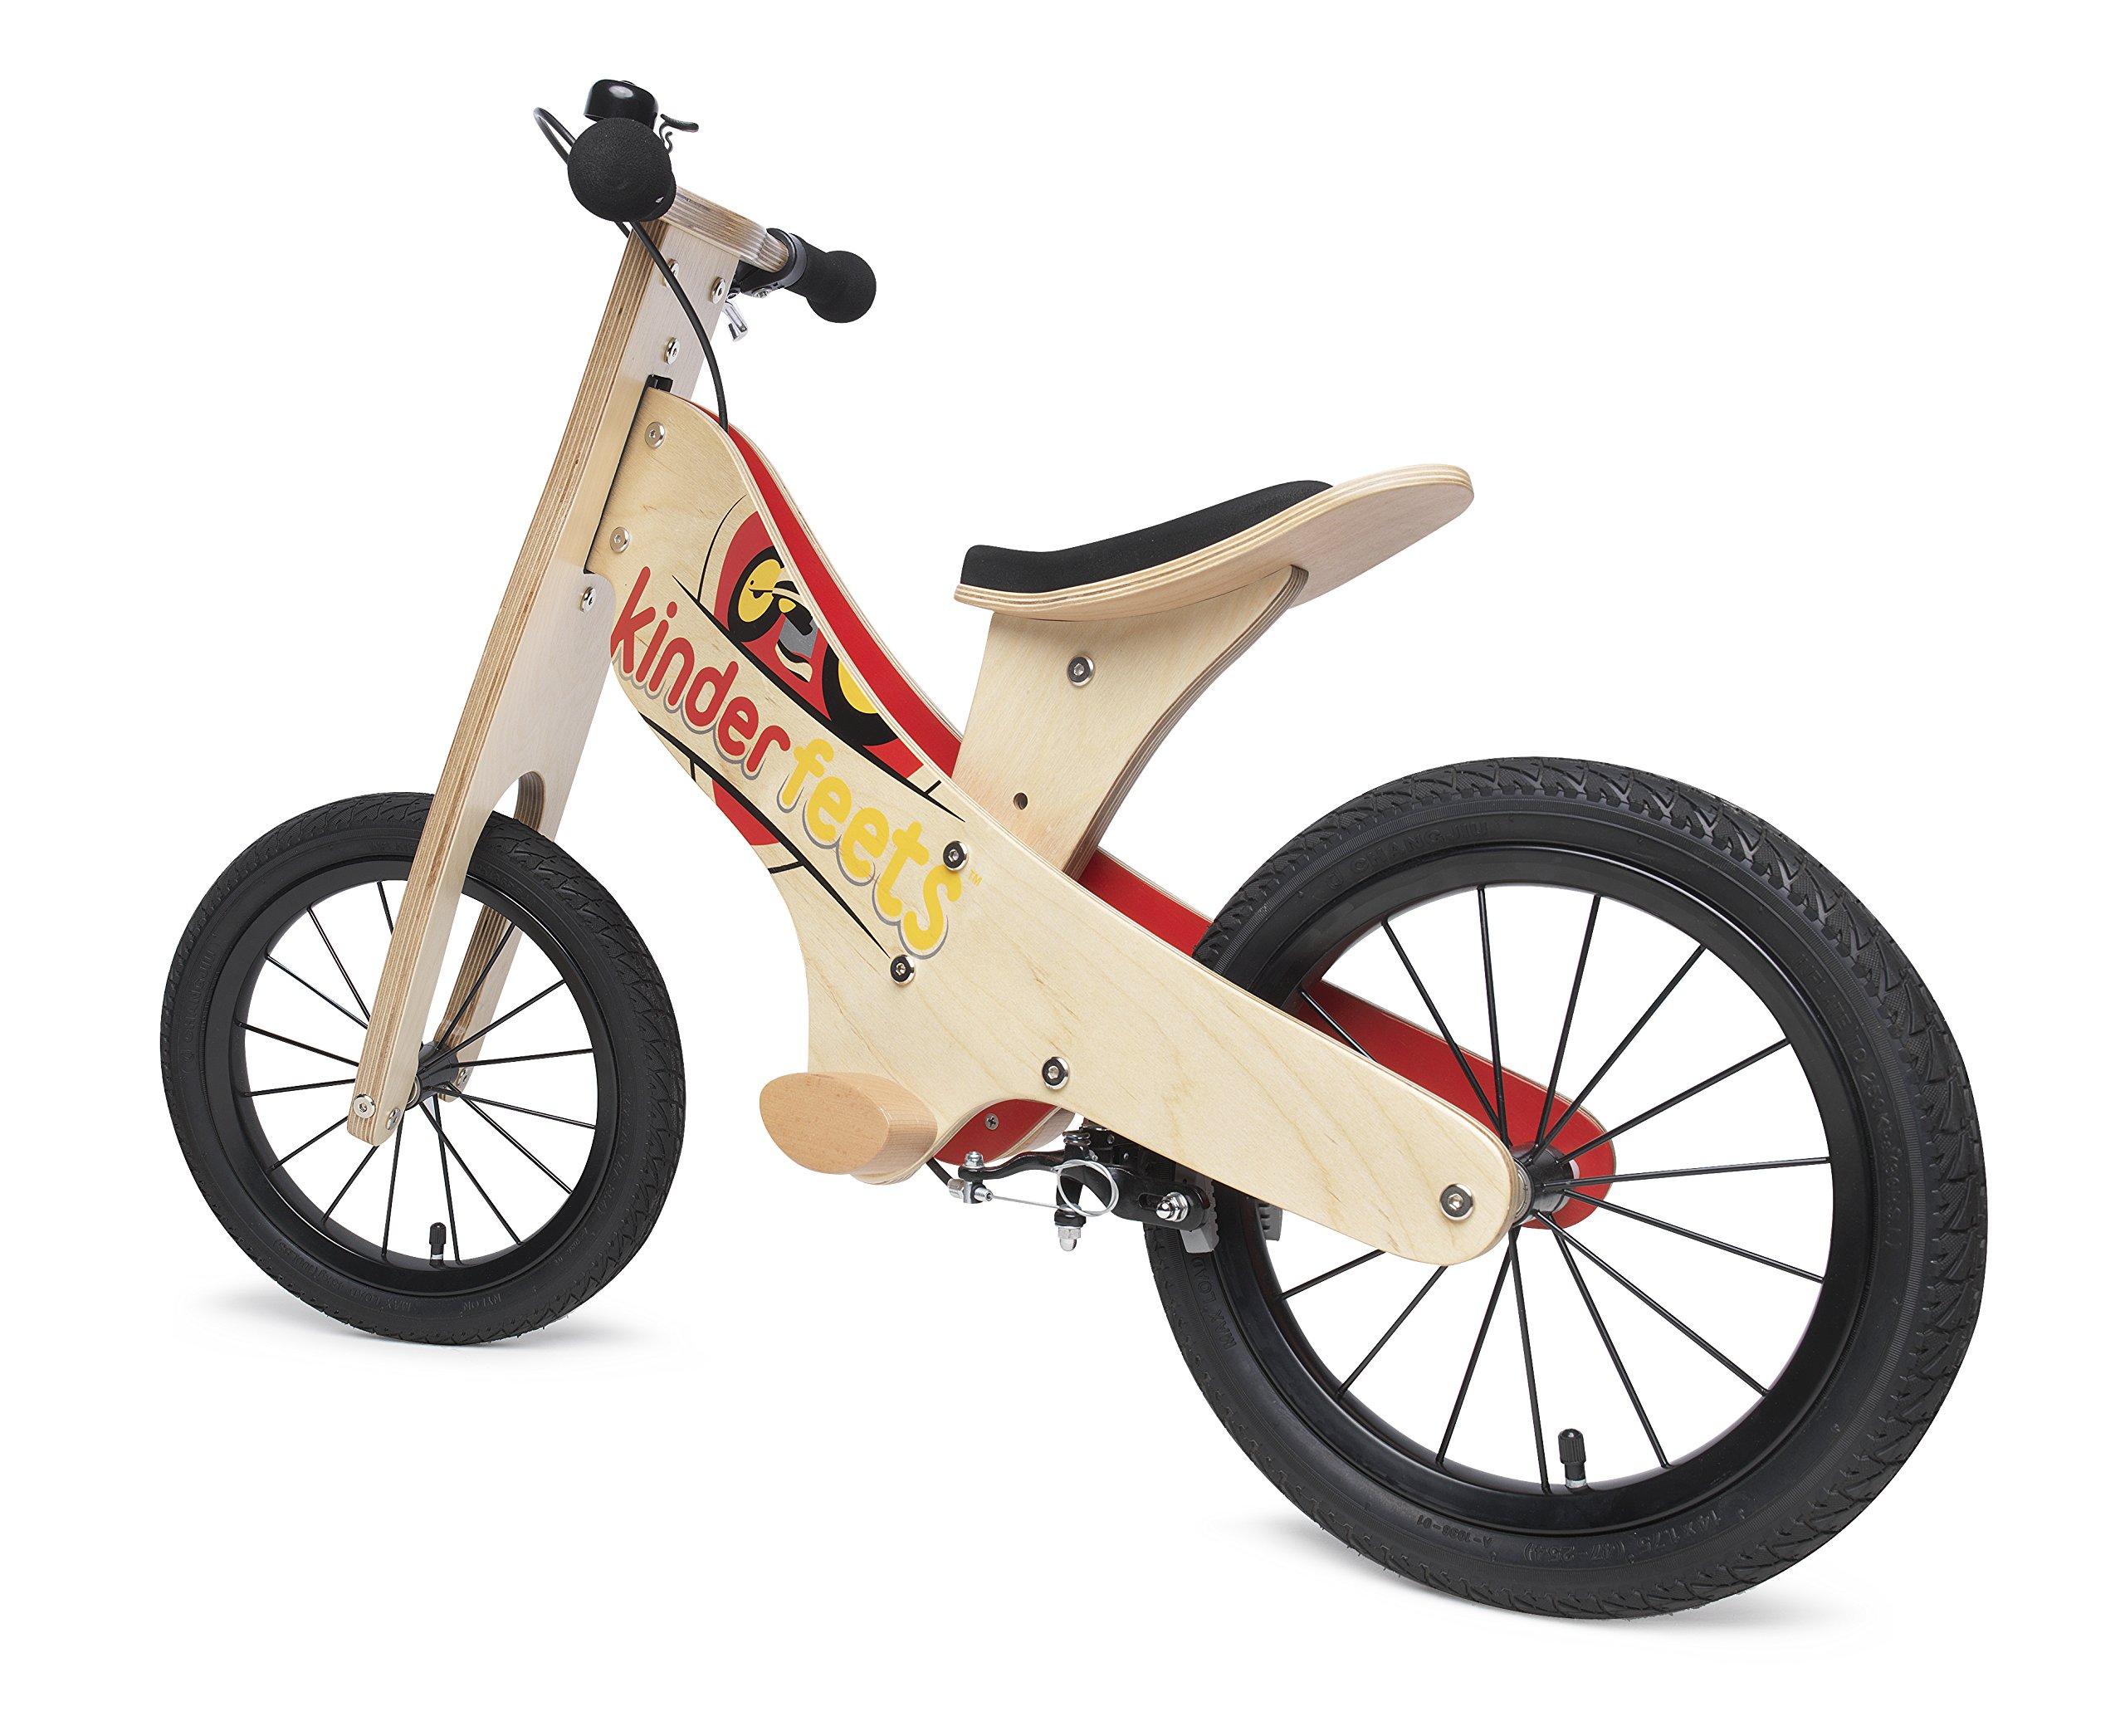 Kinderfeets Super Wooden Balance Bike by Kinderfeets